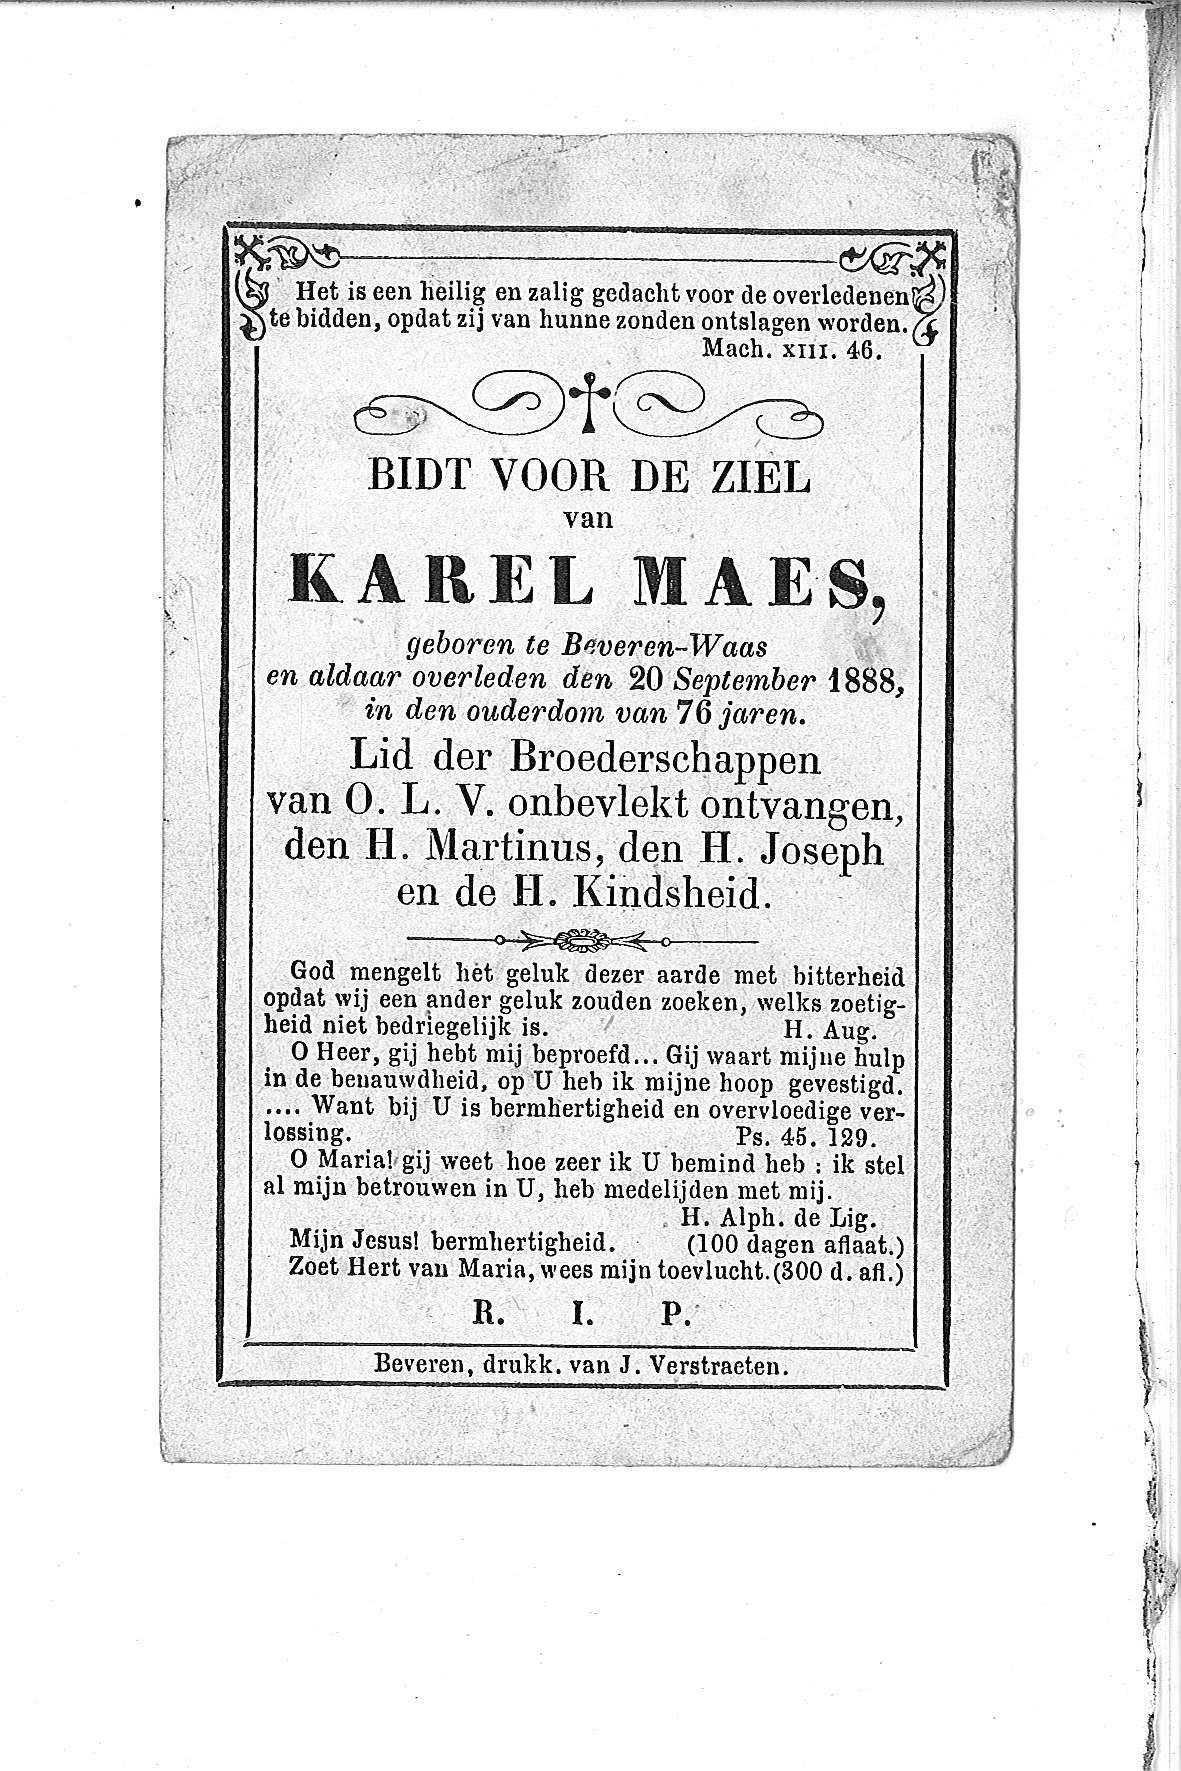 Karel(1888)20111109091504_00010.jpg